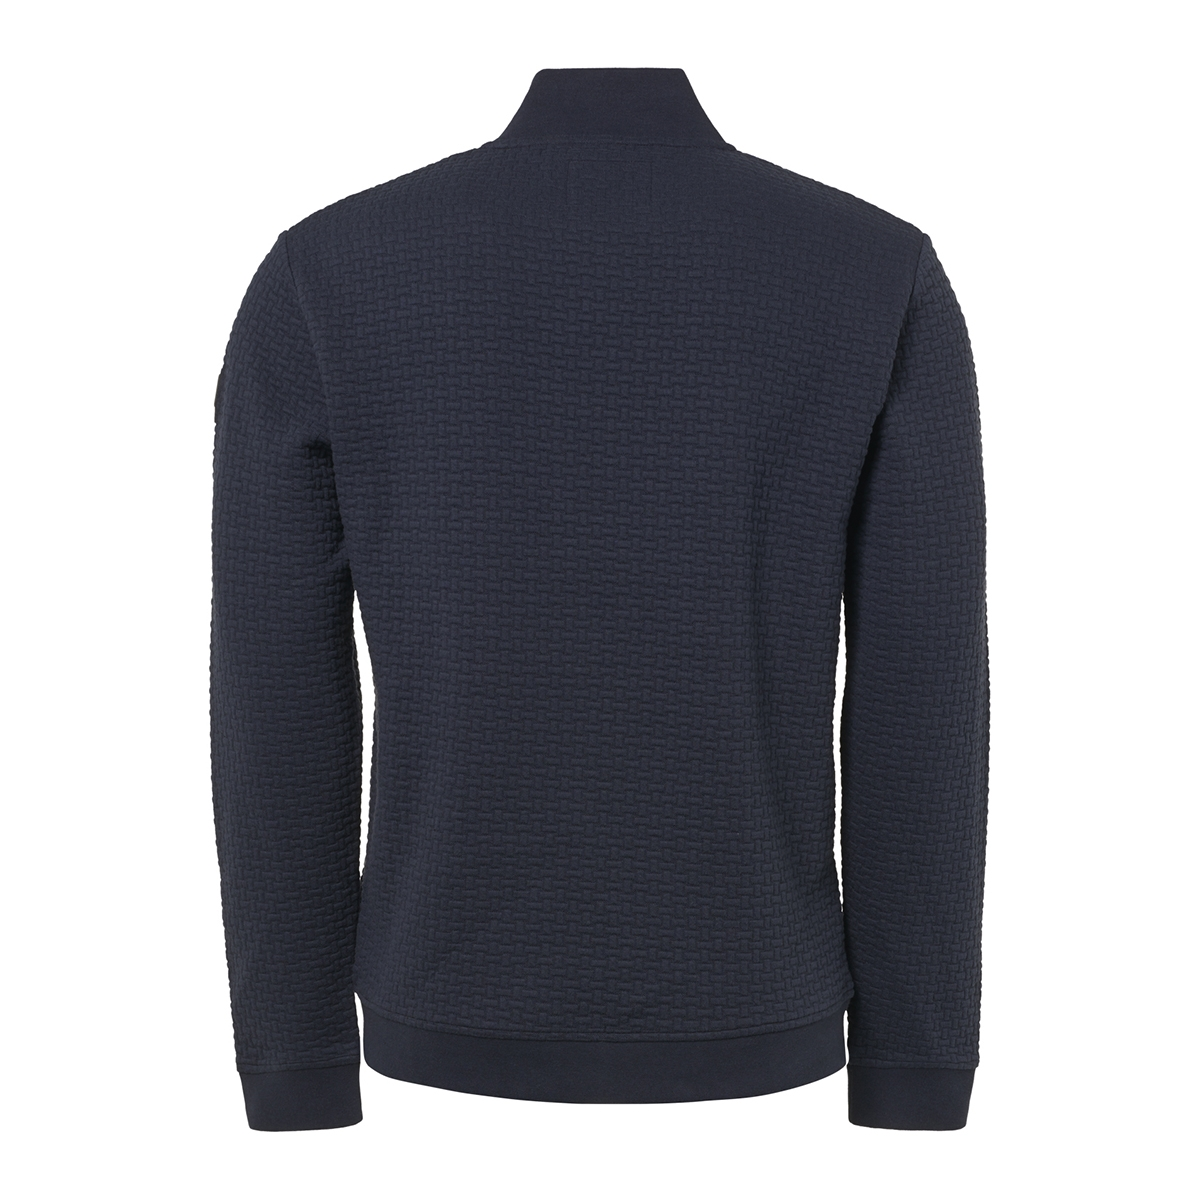 full zip jacquard cardigan 92100813 no-excess vest 078 night